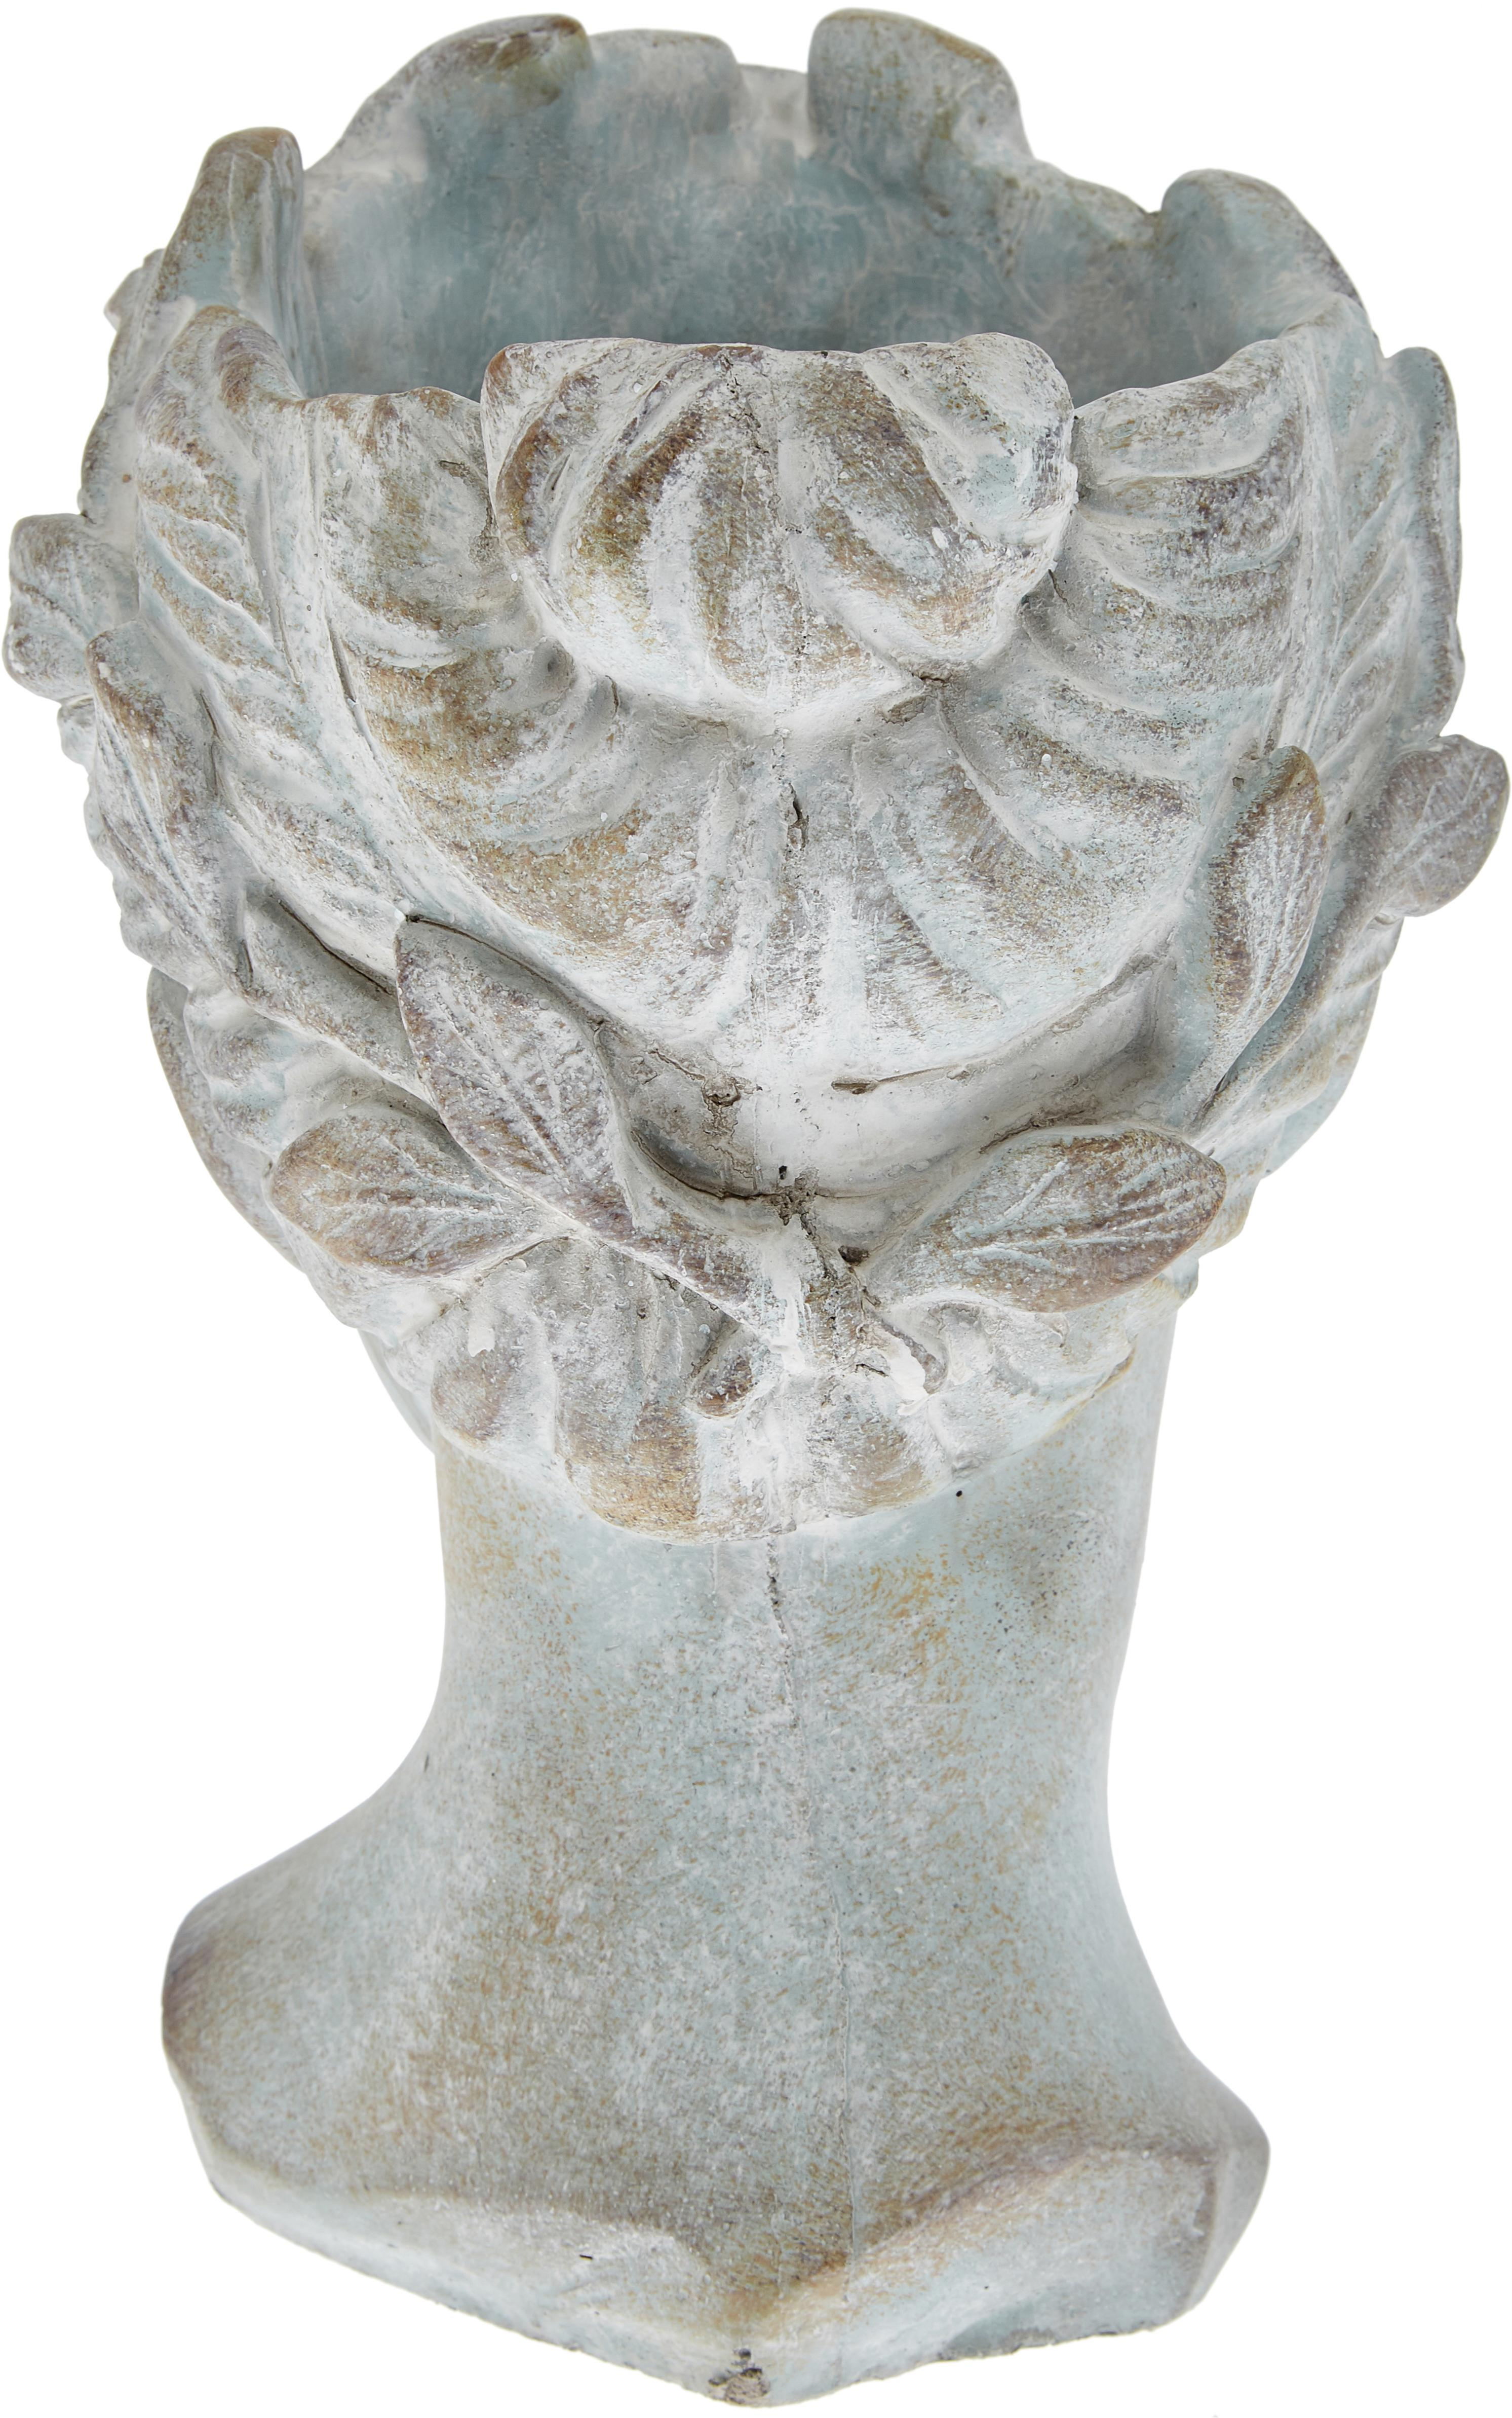 Übertopf Pass aus Zement, Zement, Grau, Ø 18 x H 27 cm